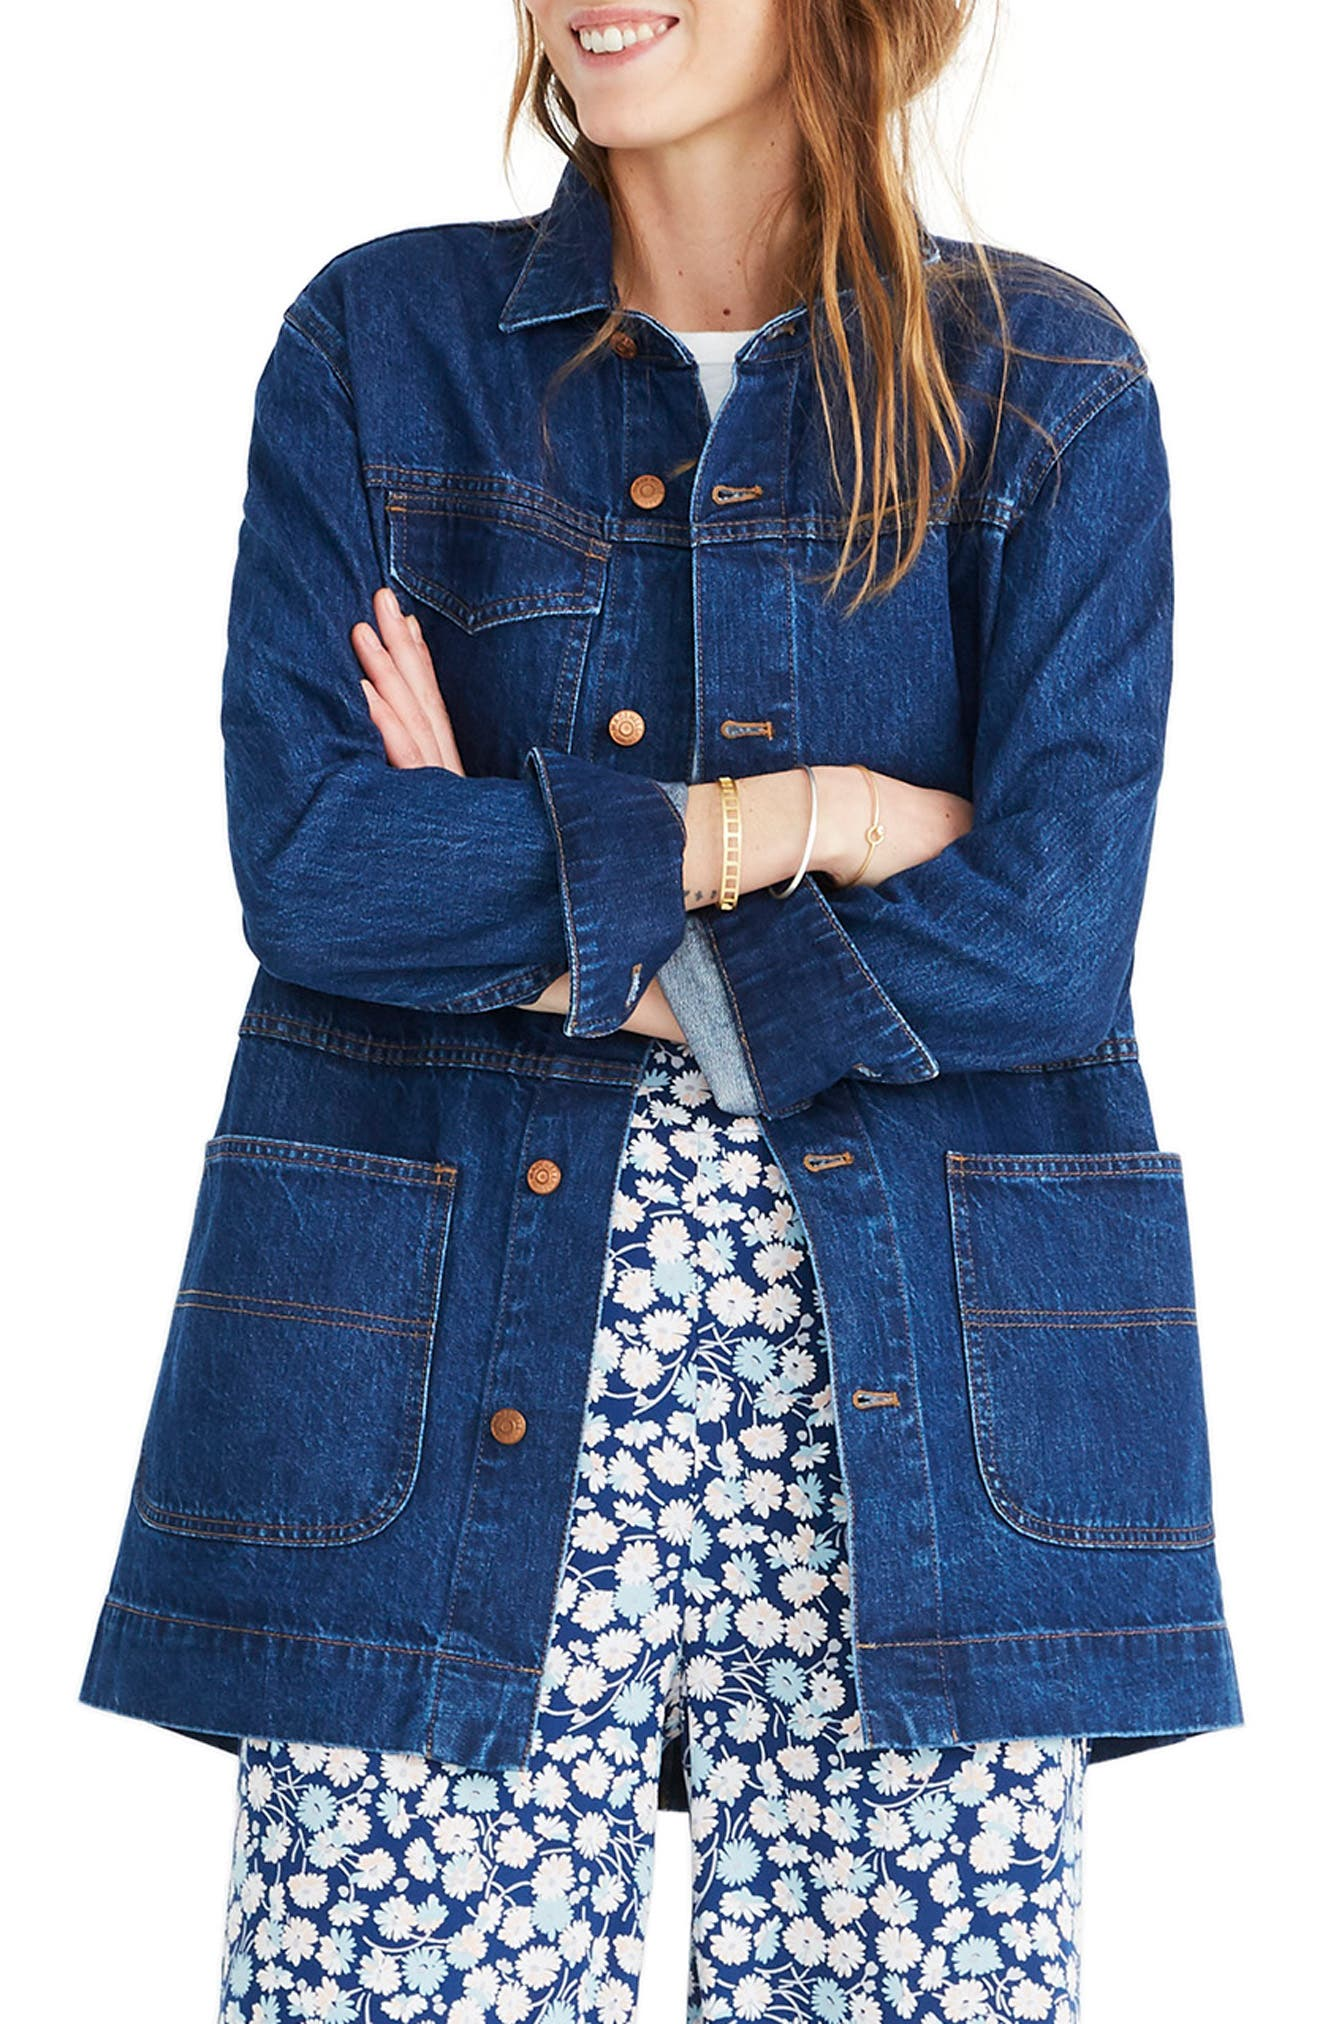 MADEWELL, Oversized Denim Chore Jacket, Main thumbnail 1, color, 400